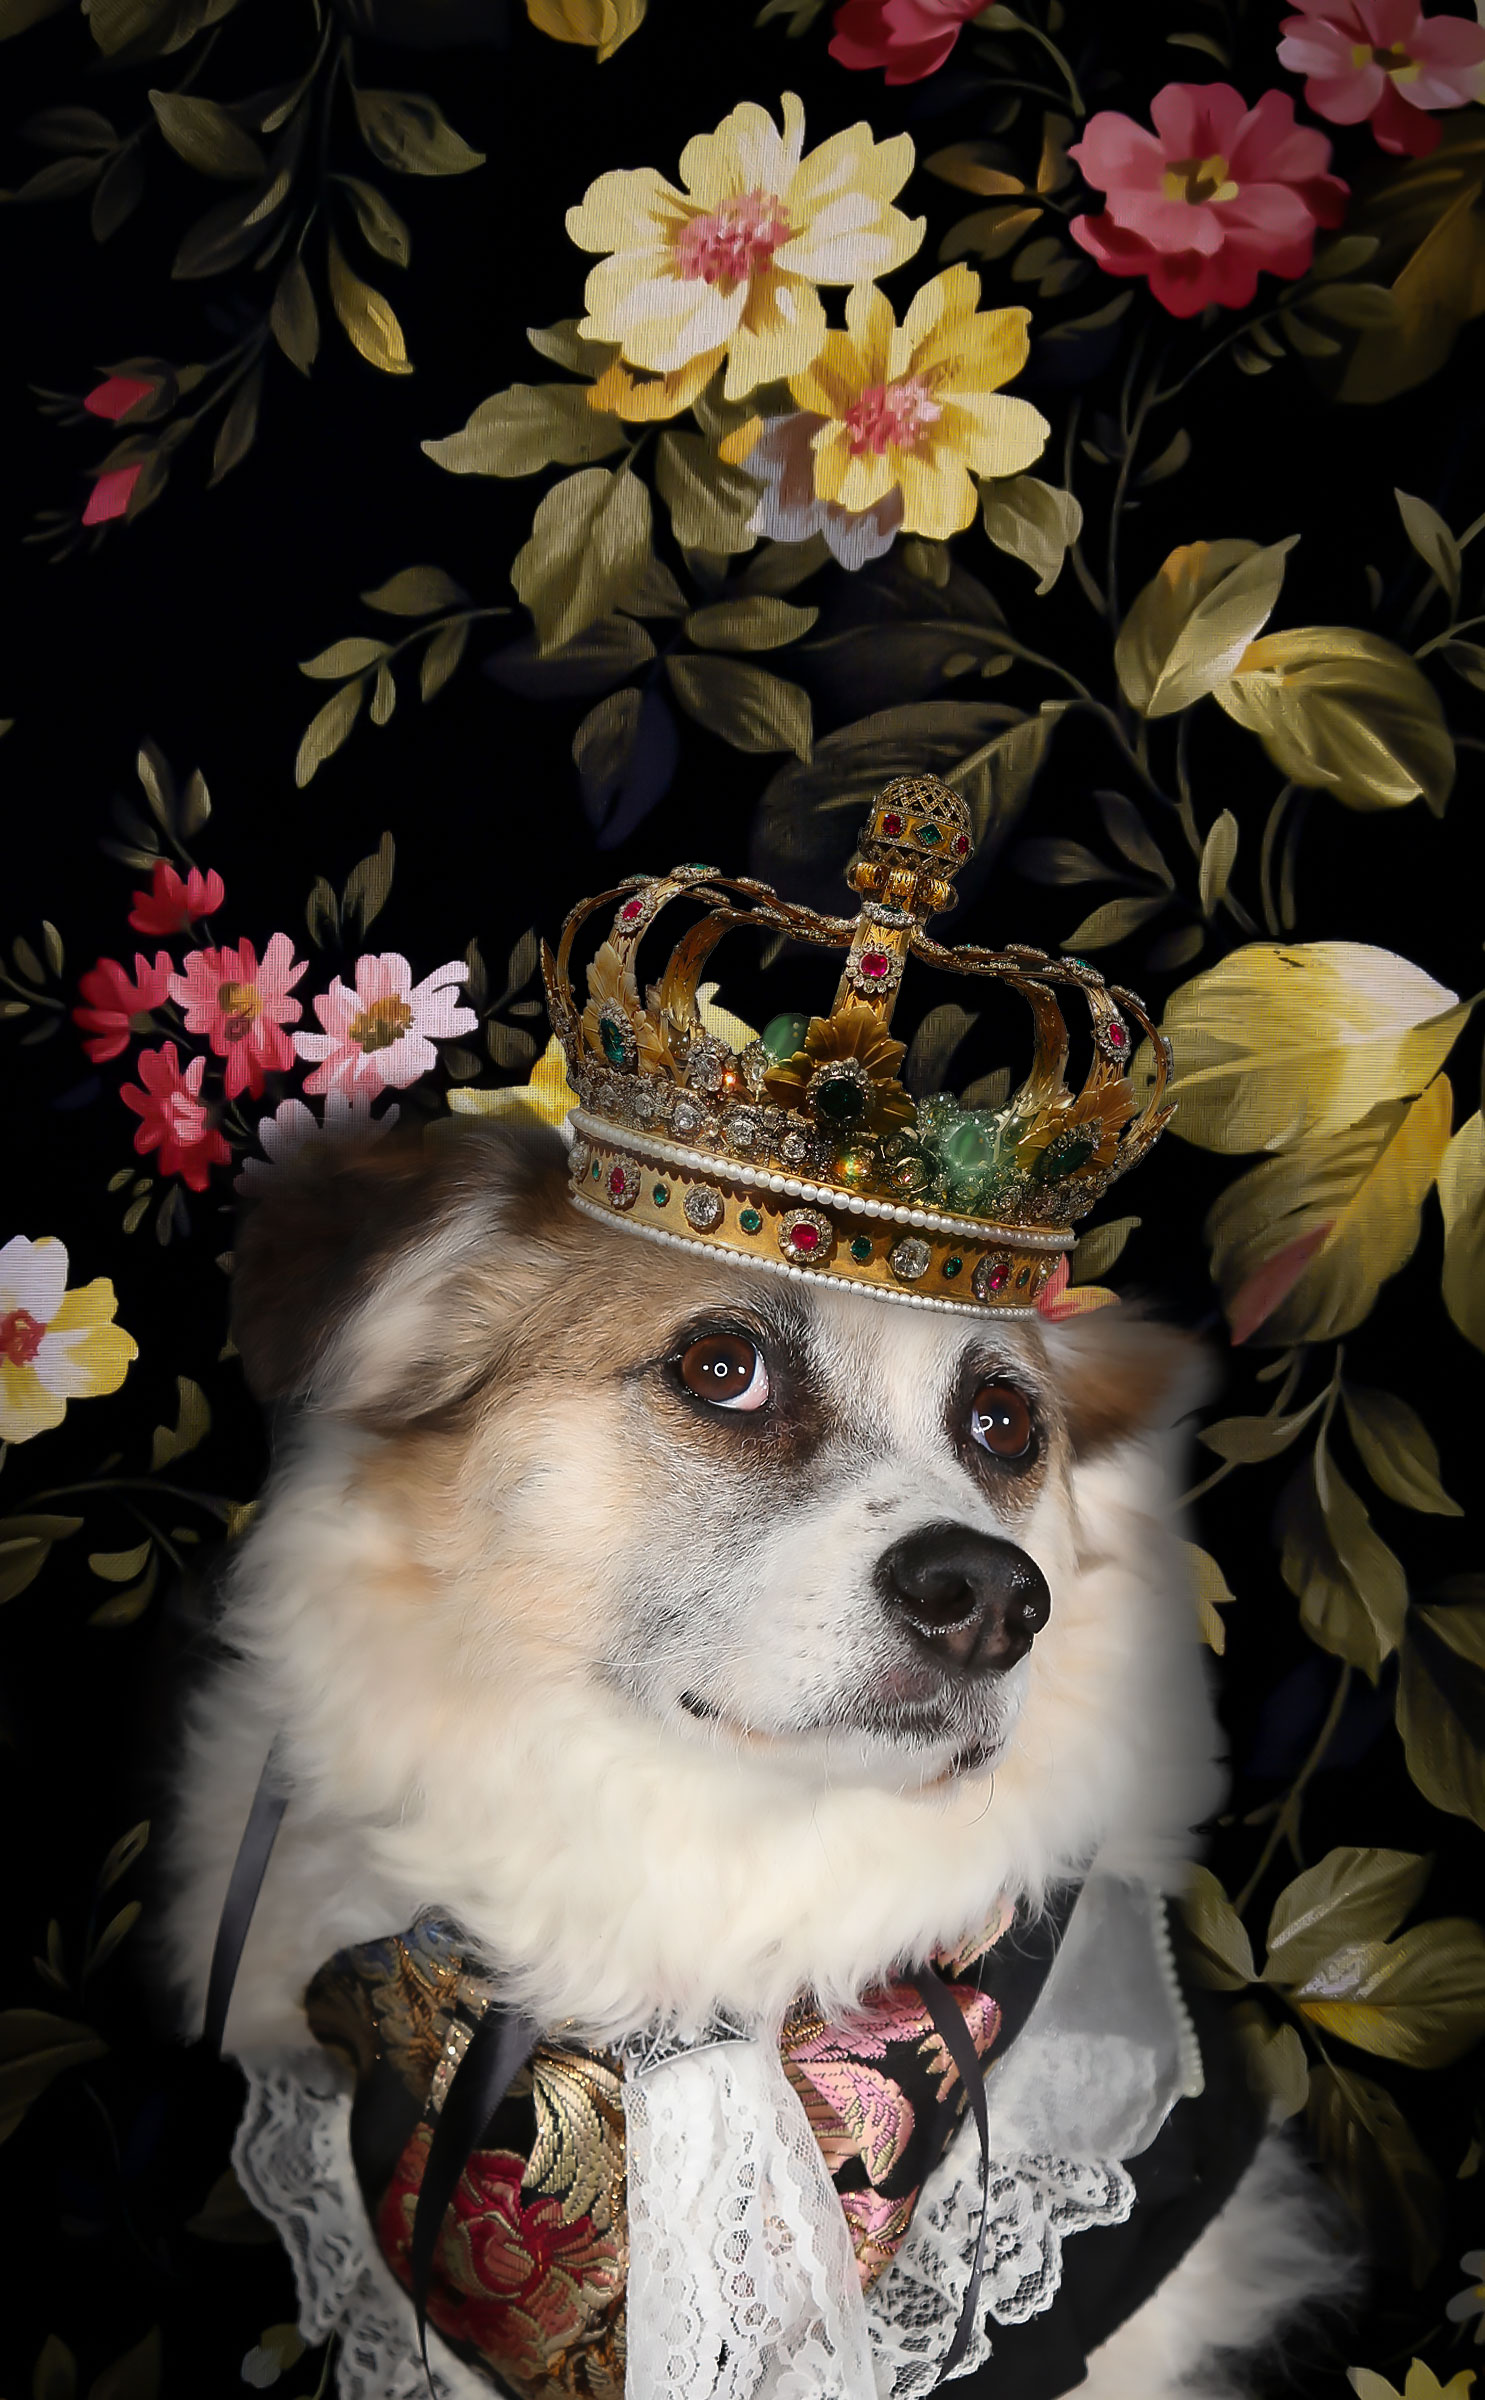 darwins dog corgi with crown